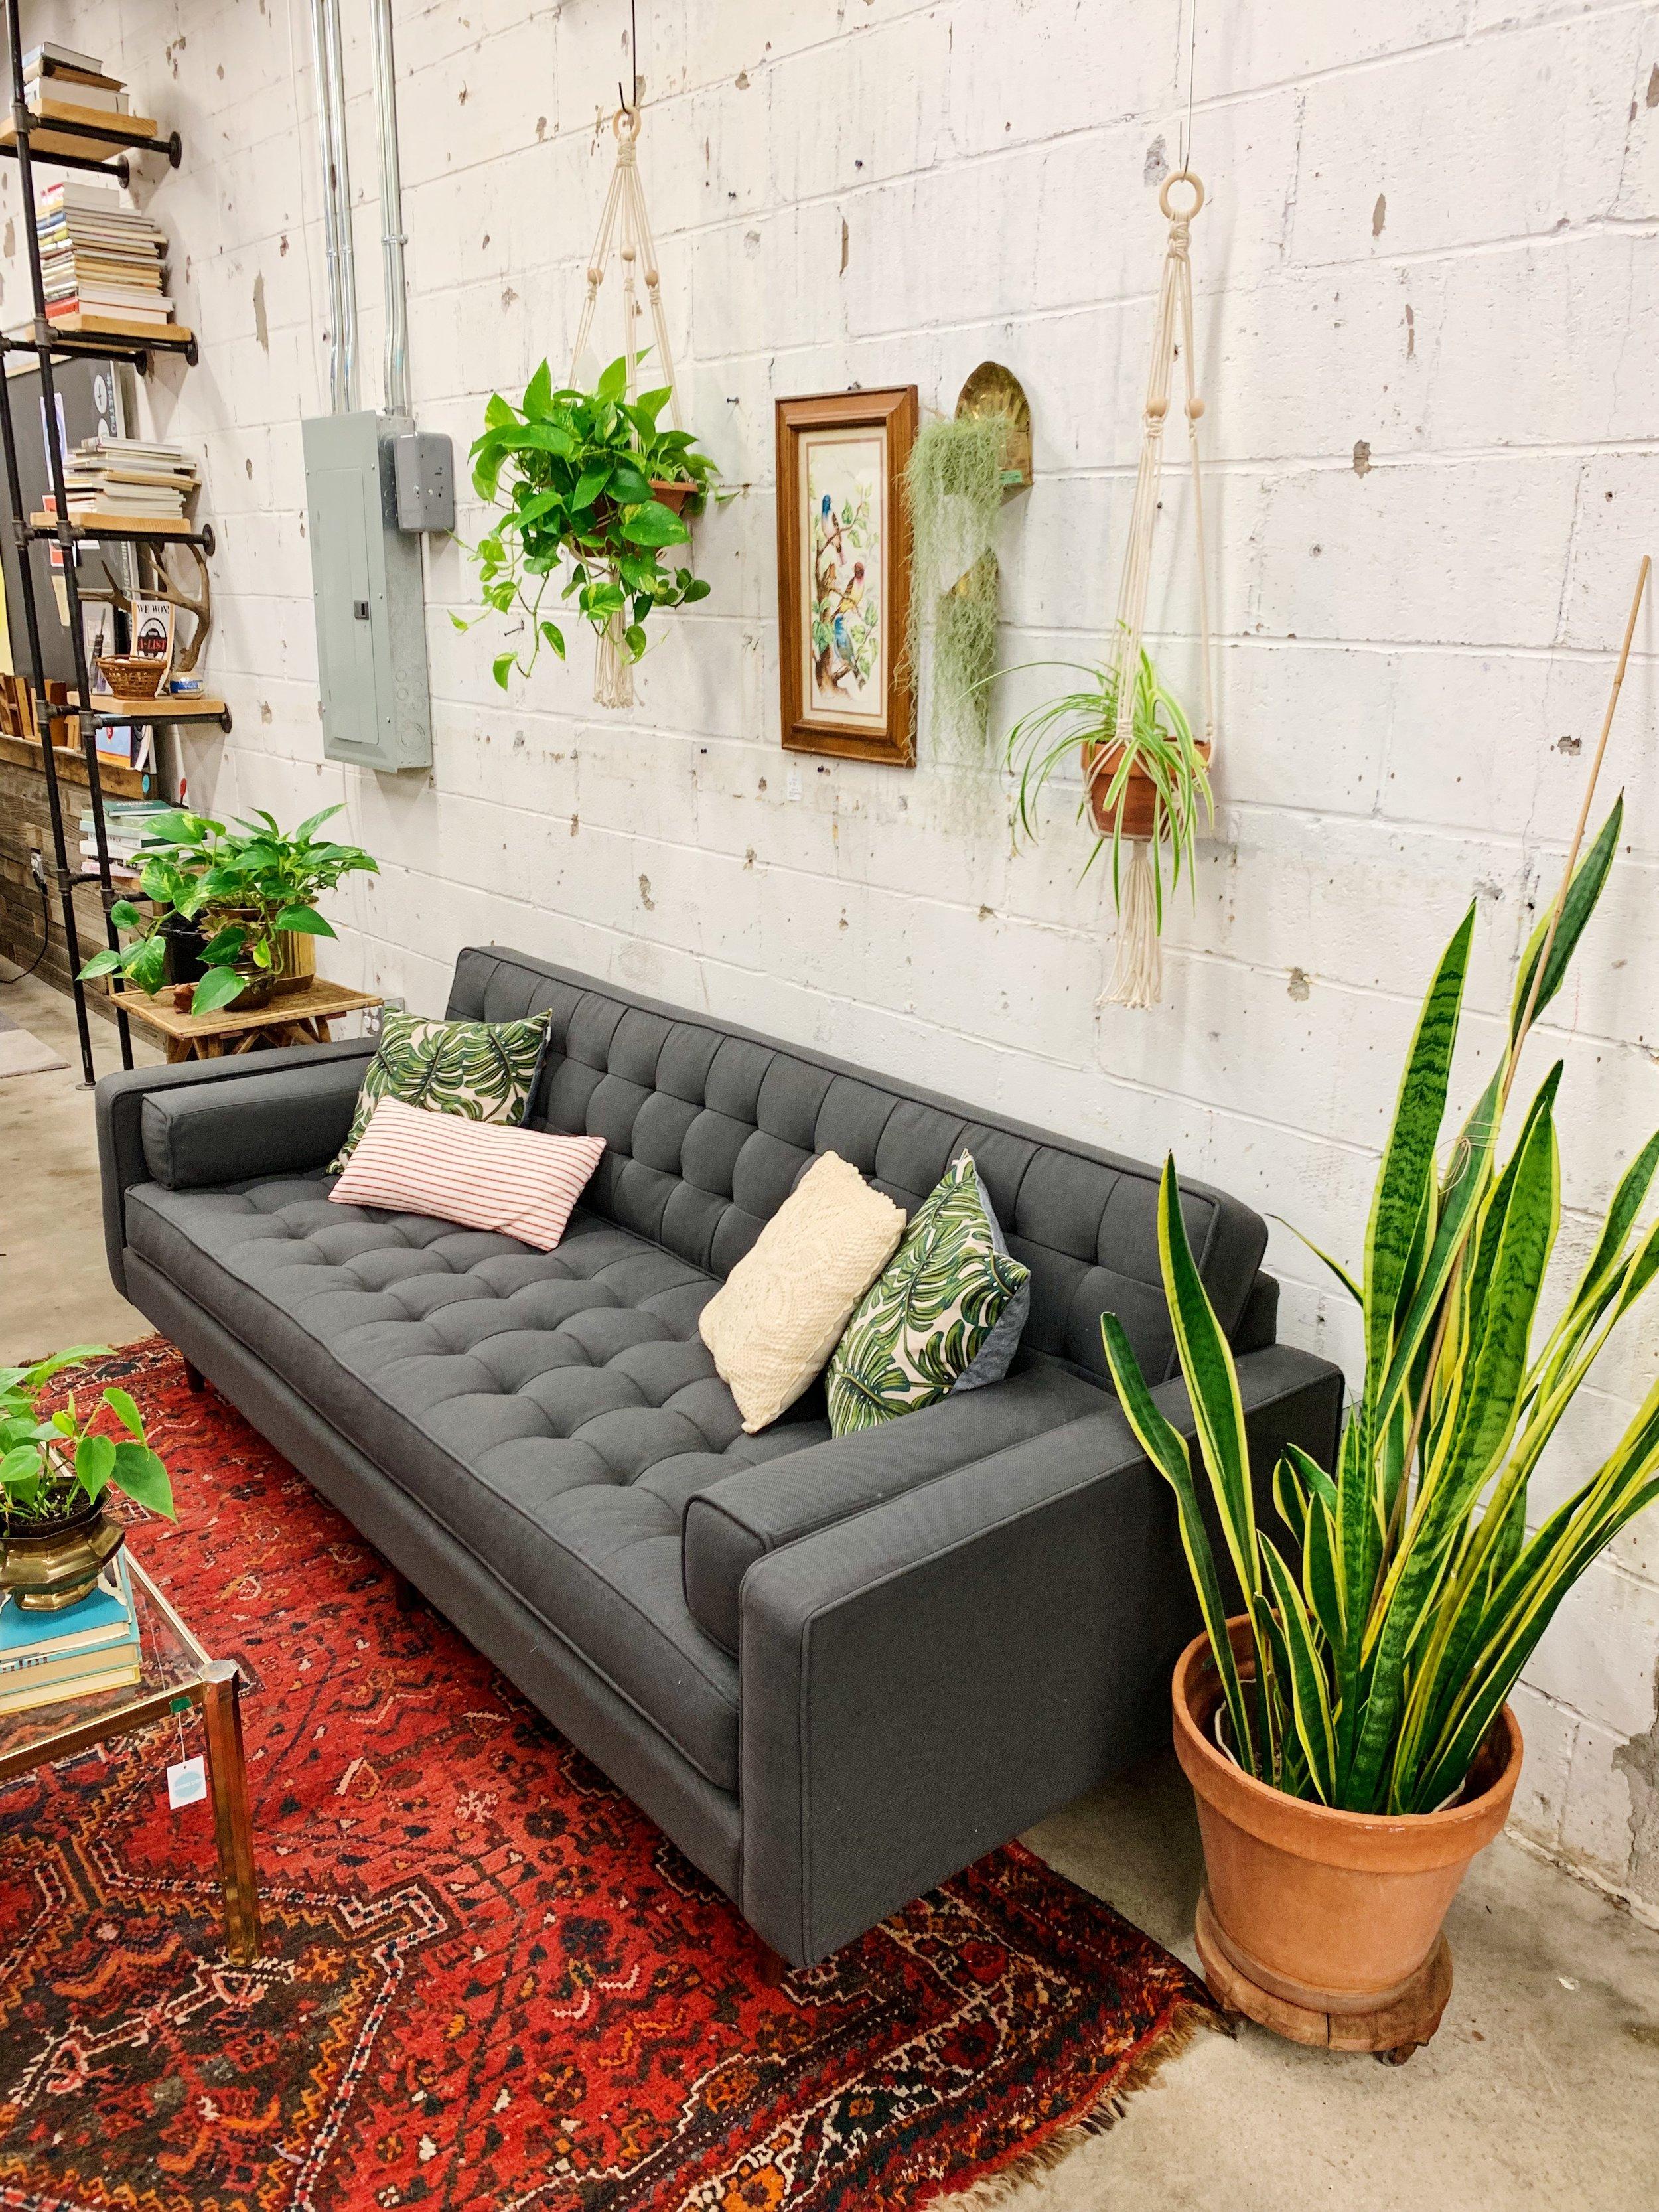 Gus Modern Plant Lady Style Houseplants Tulsa Oklahoma Living Room Furniture Decor